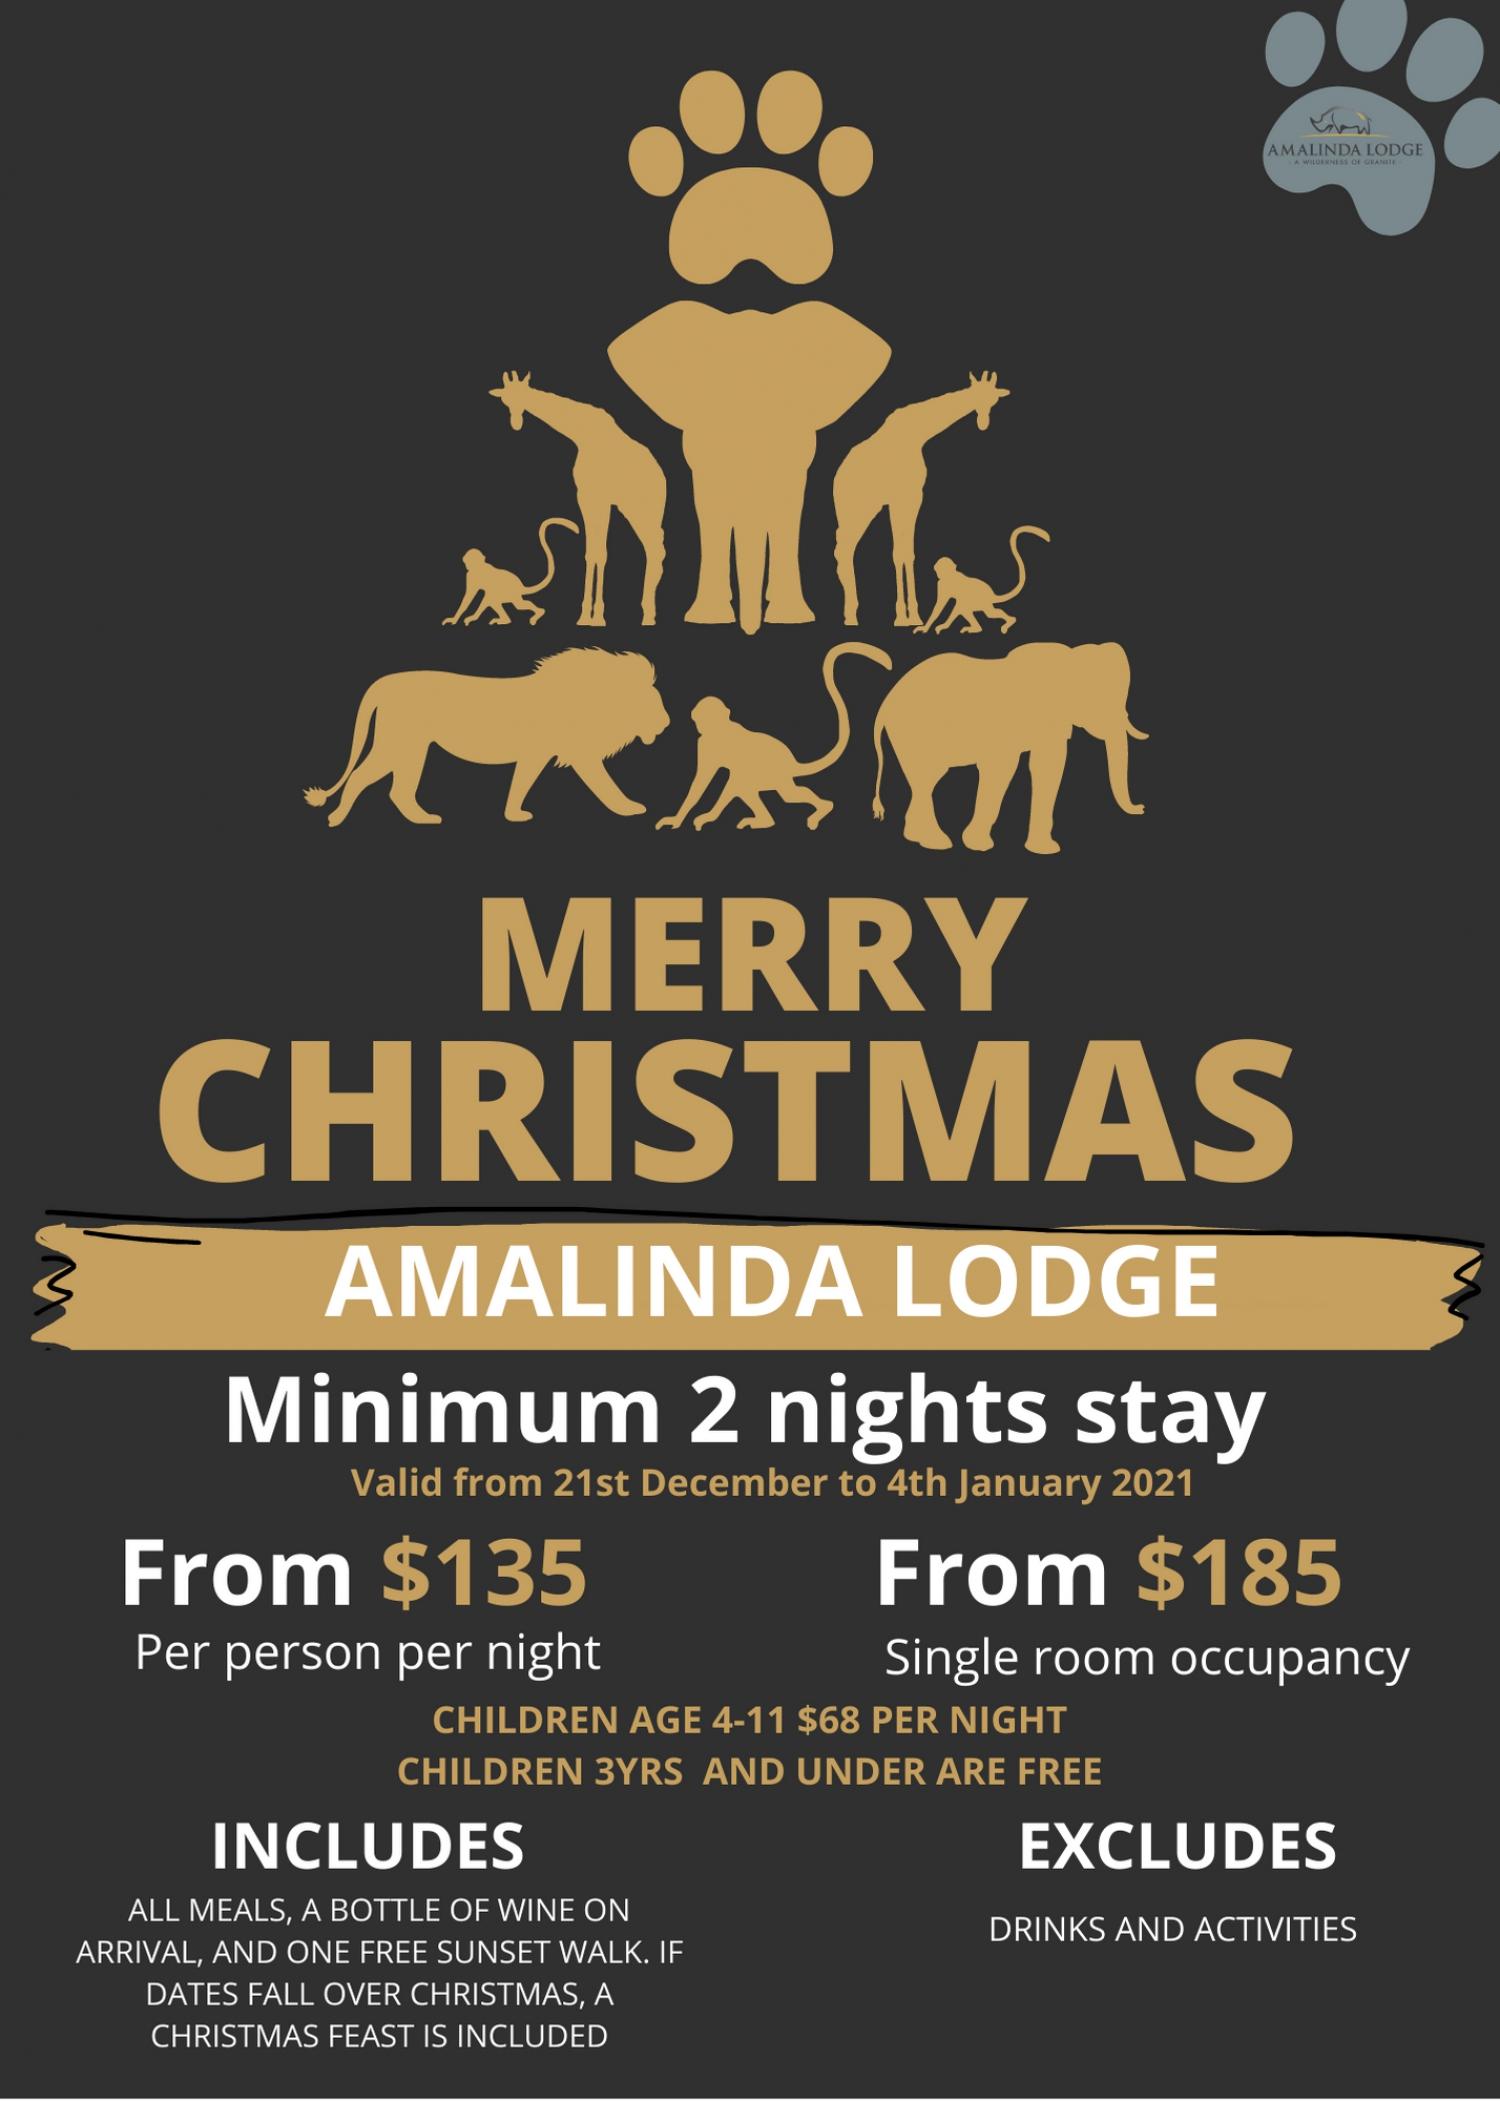 Merry Christmas Special At Amalinda lodge